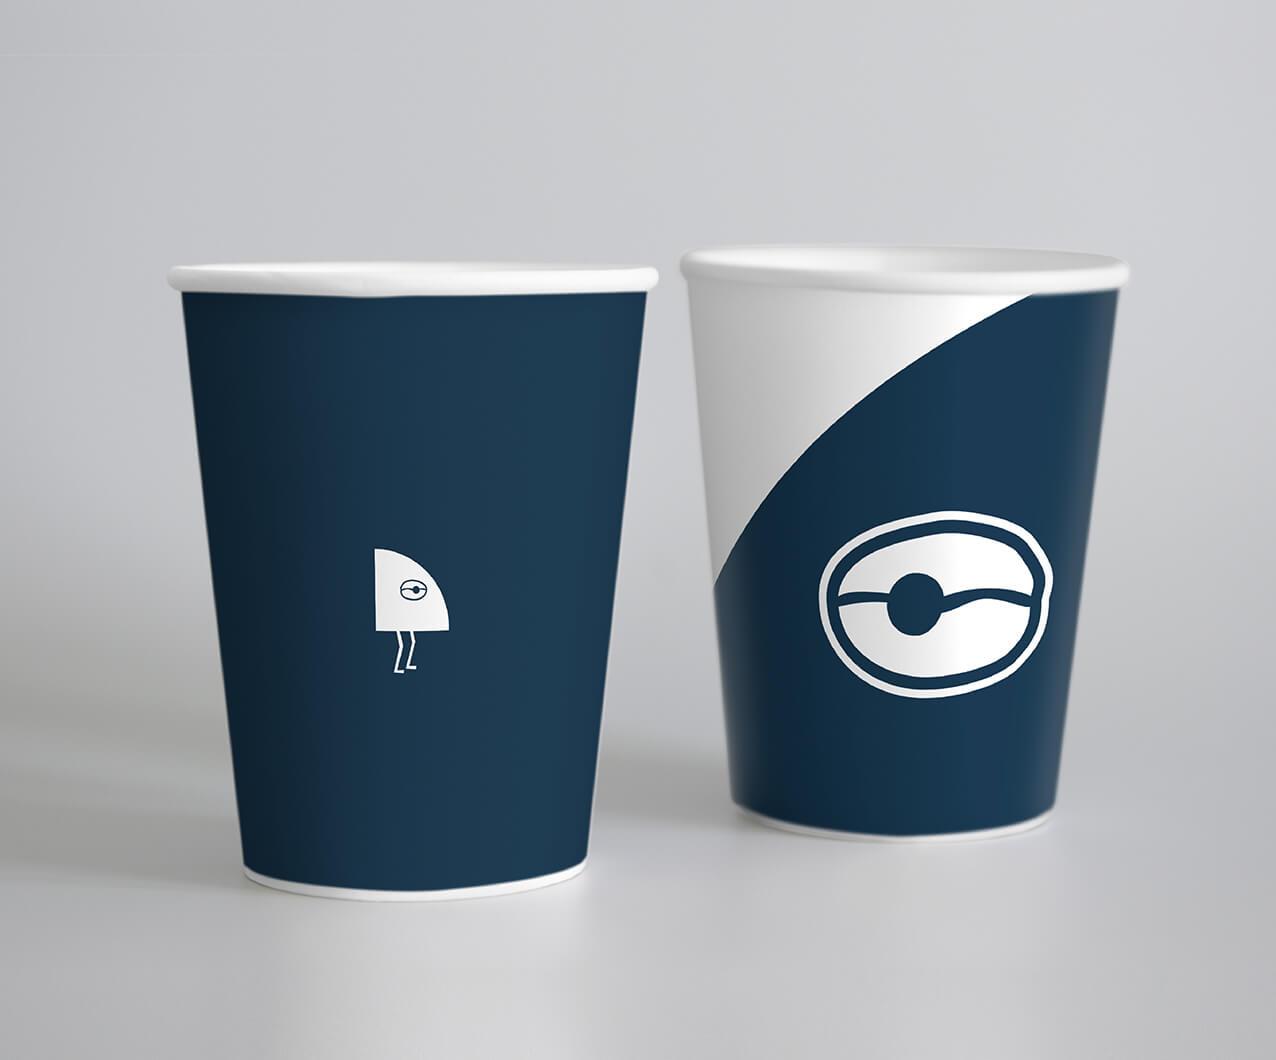 Coffee shop branded cup design